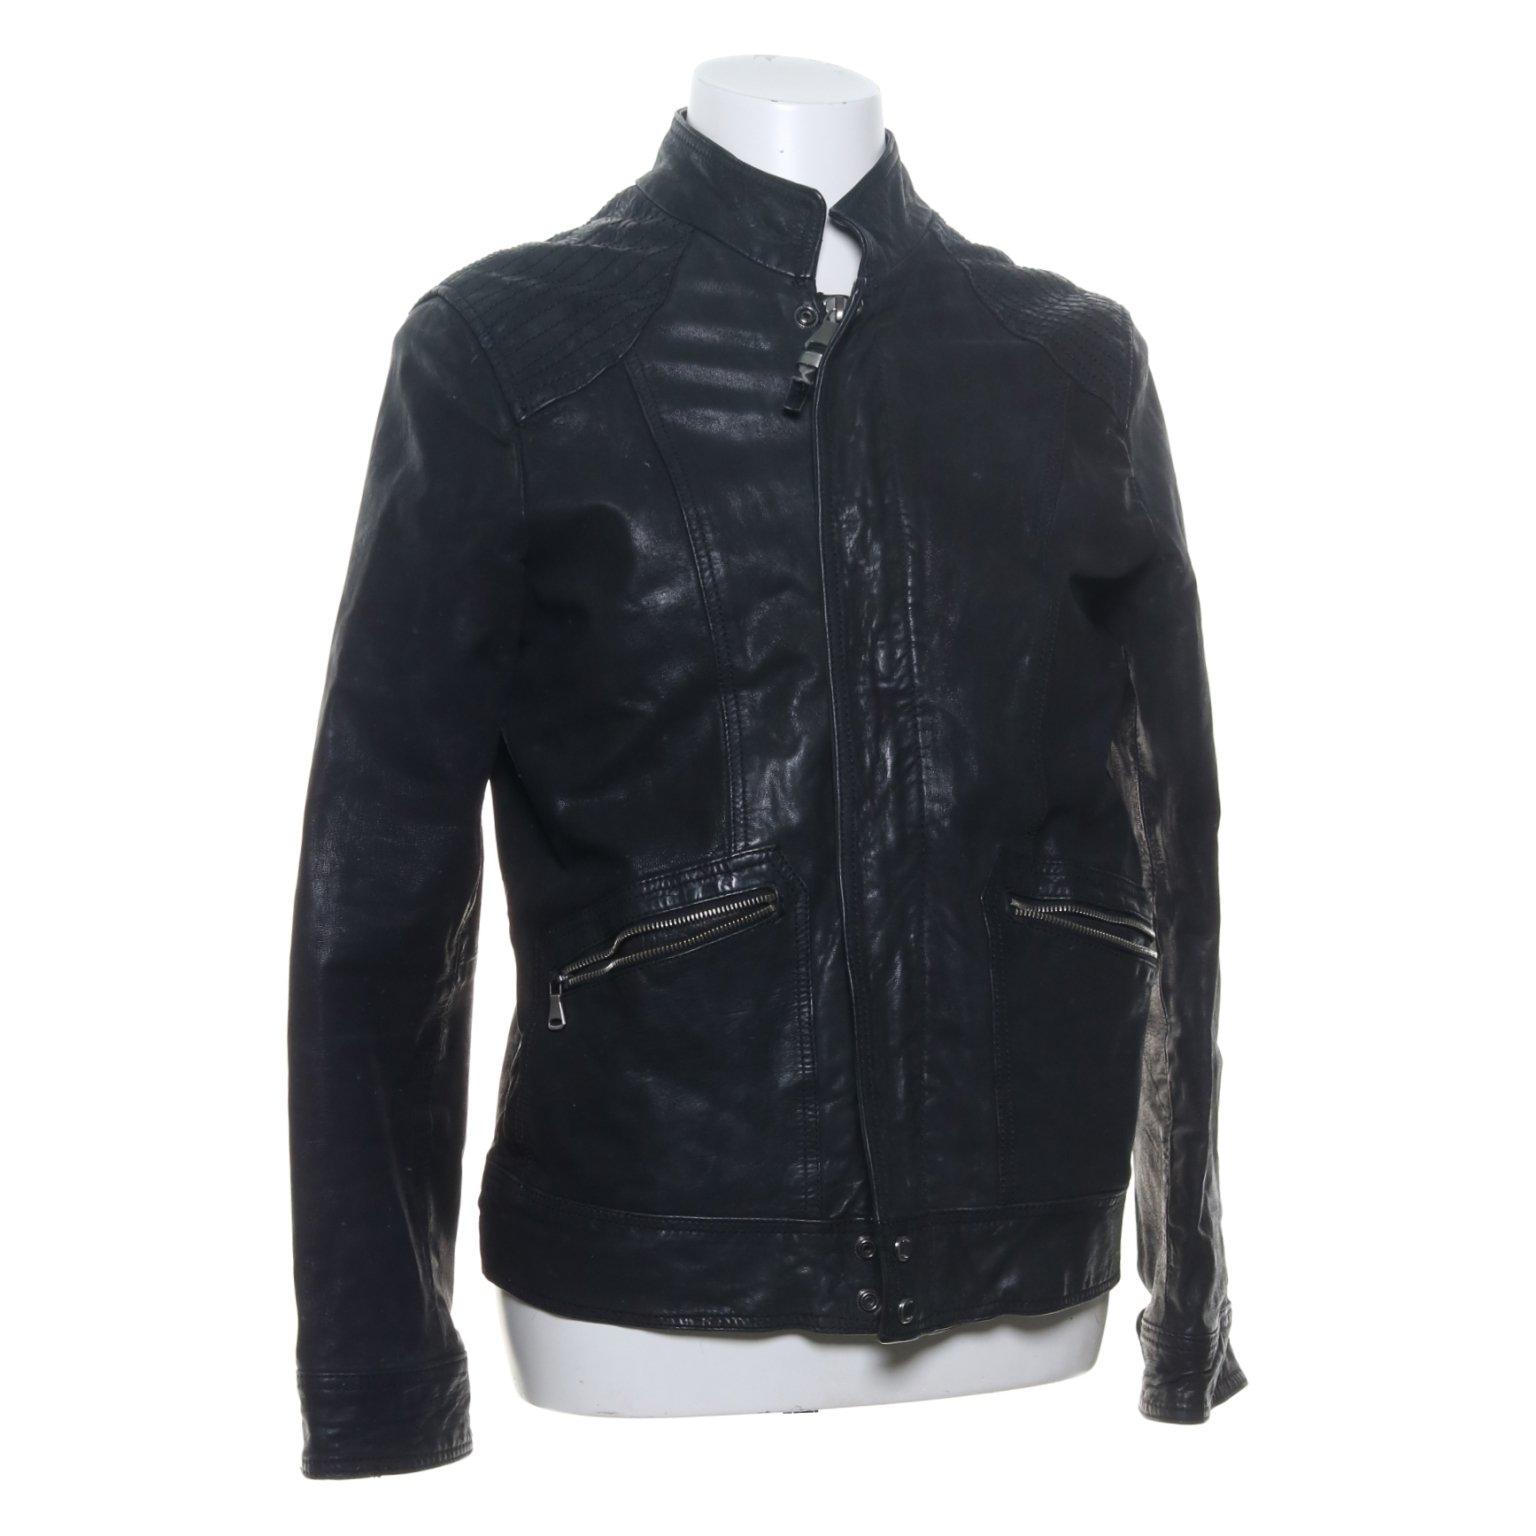 Zara Man, Skinnjacka, Strl: M, Sport Moda.. (383494172) ᐈ